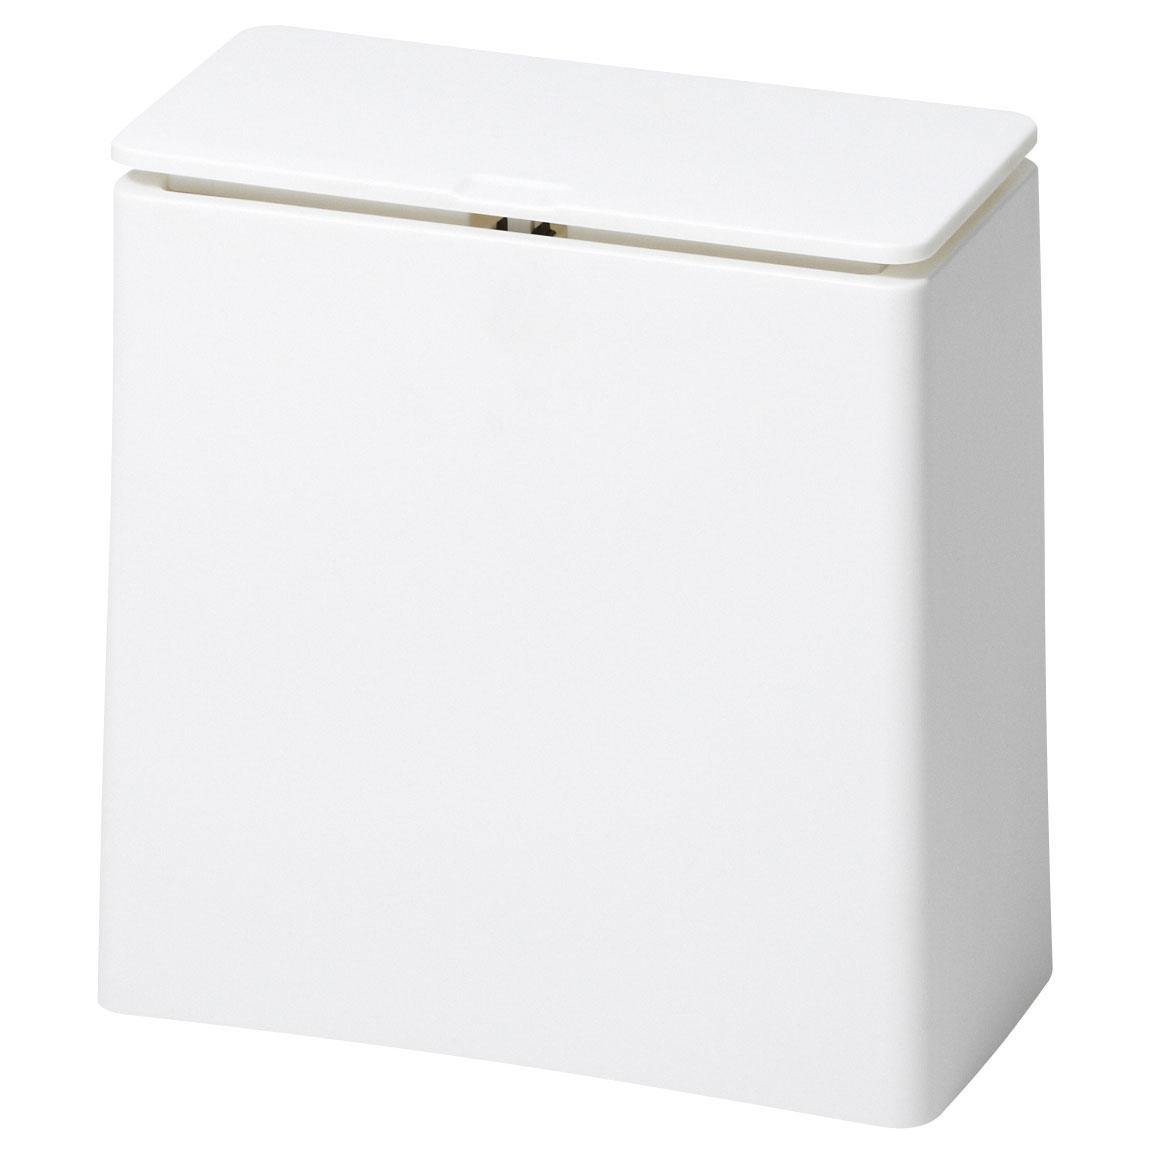 TUBELOR mini flap チューブラーミニフラップ 1.4L ホワイト / ideacoの写真